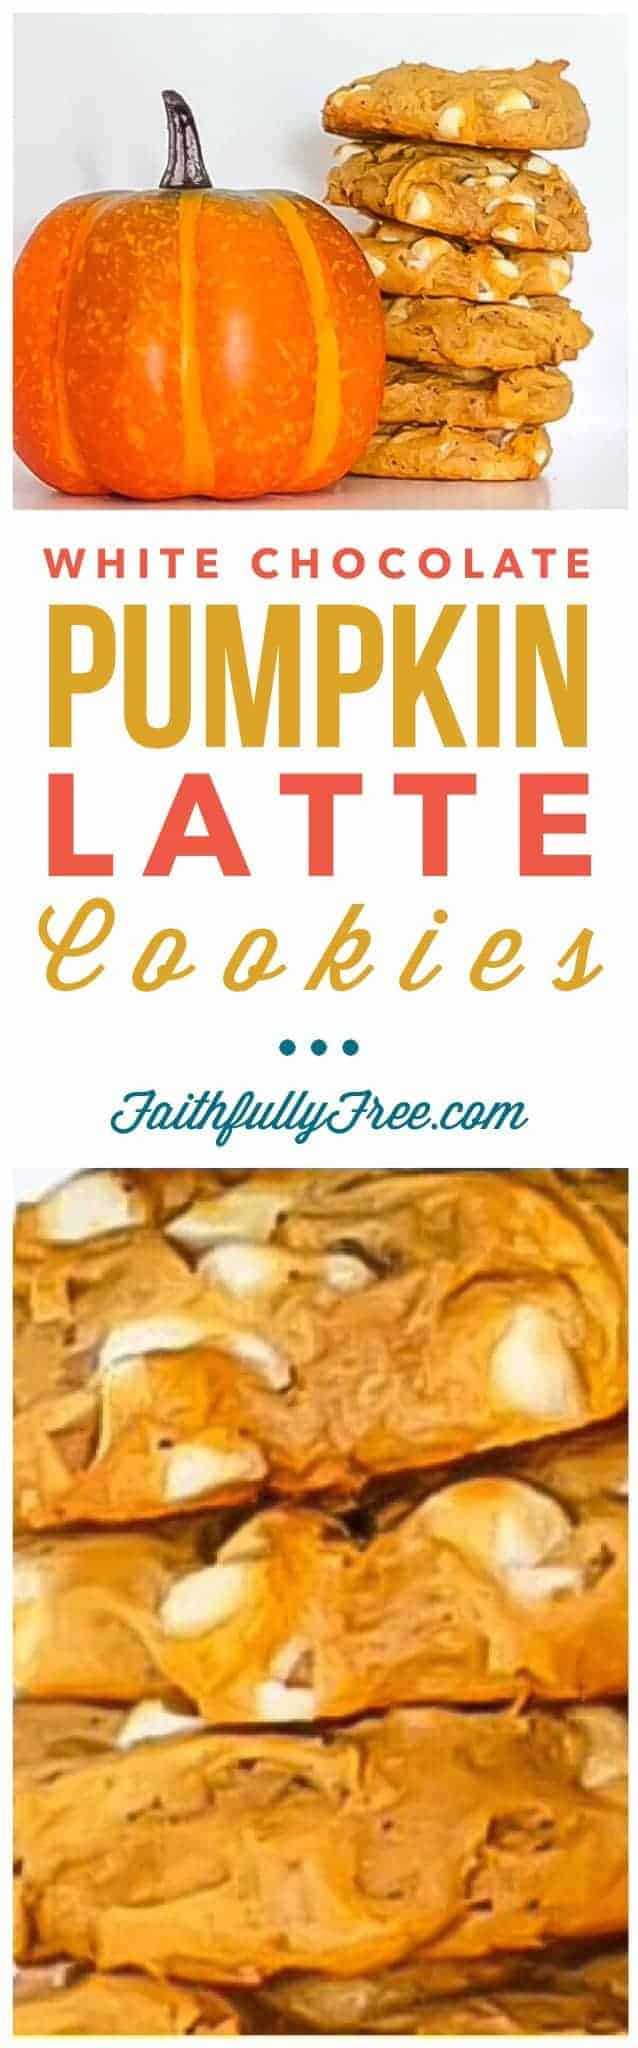 White Chocolate Pumpkin Latte Cookies Recipe